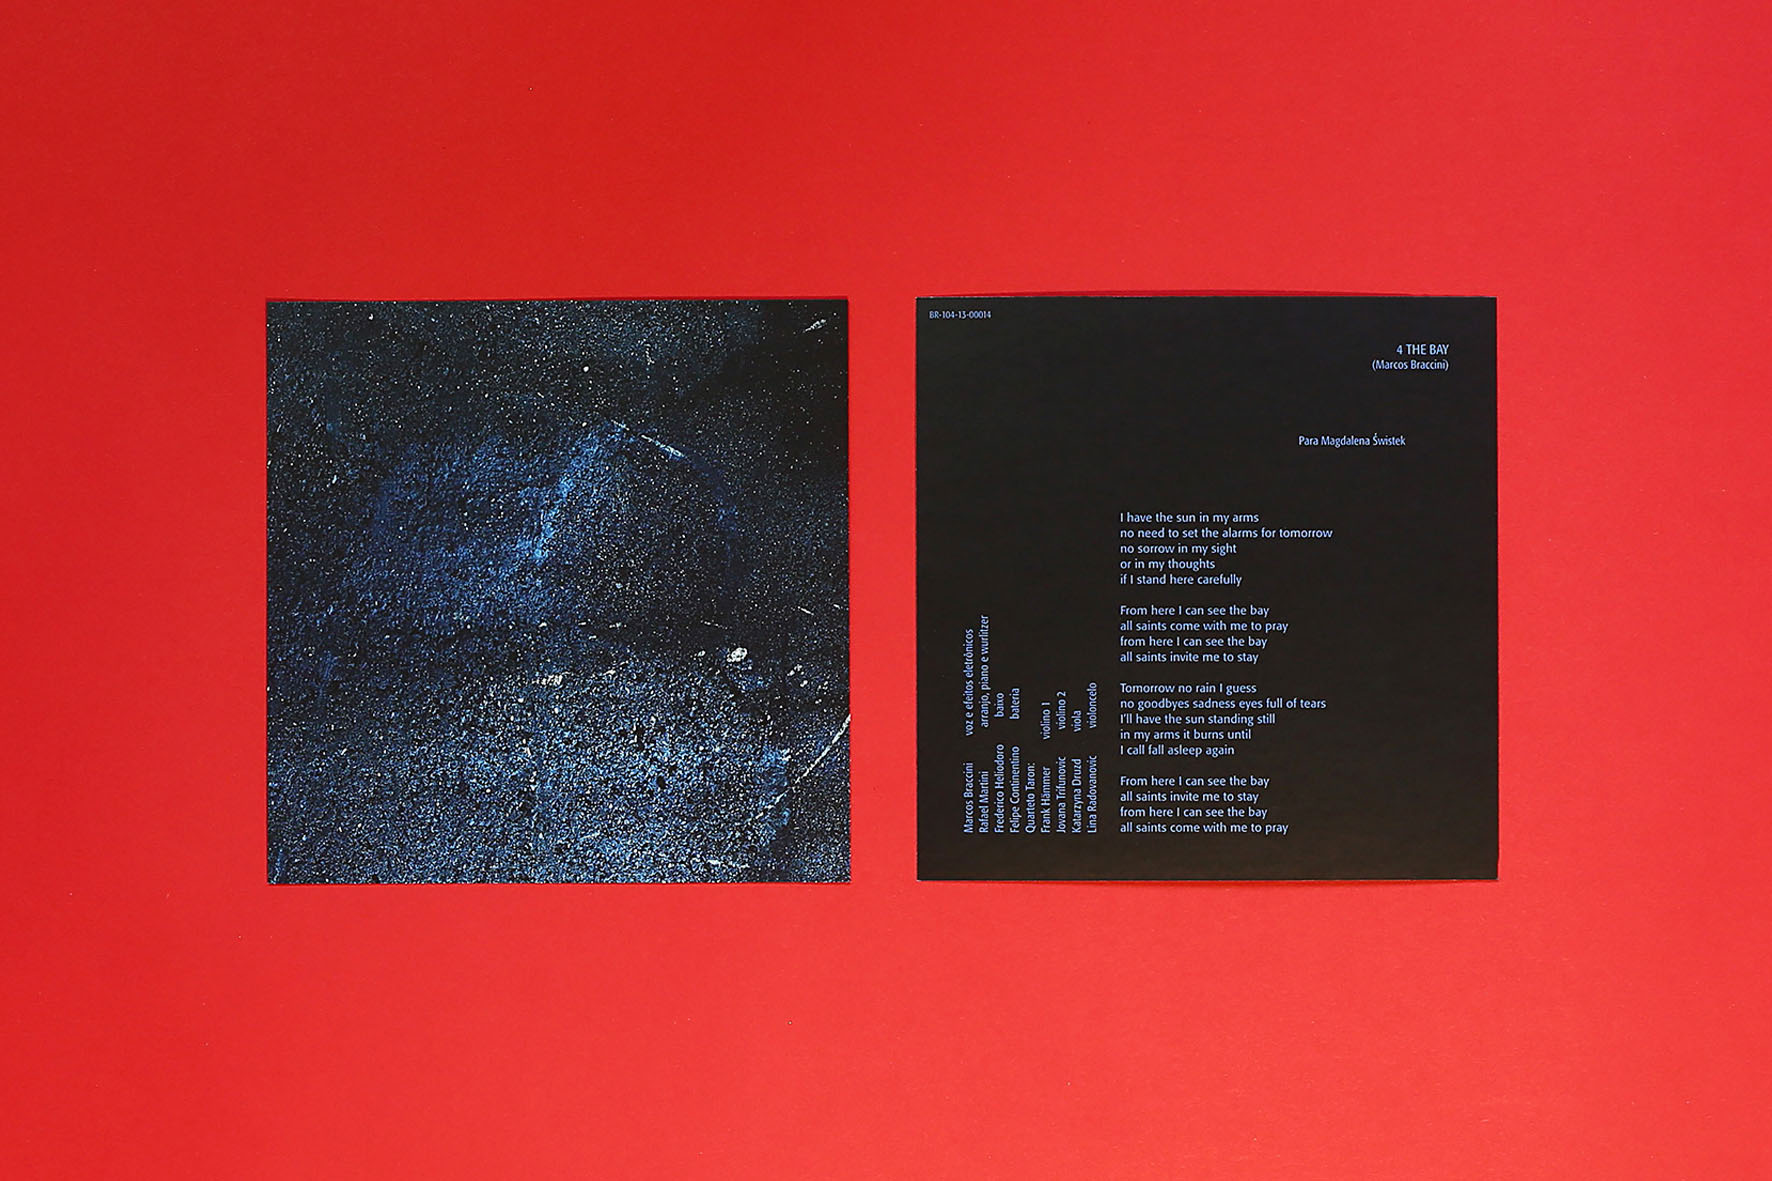 Noturno-Daniel-Cavalcanti-ficha-5